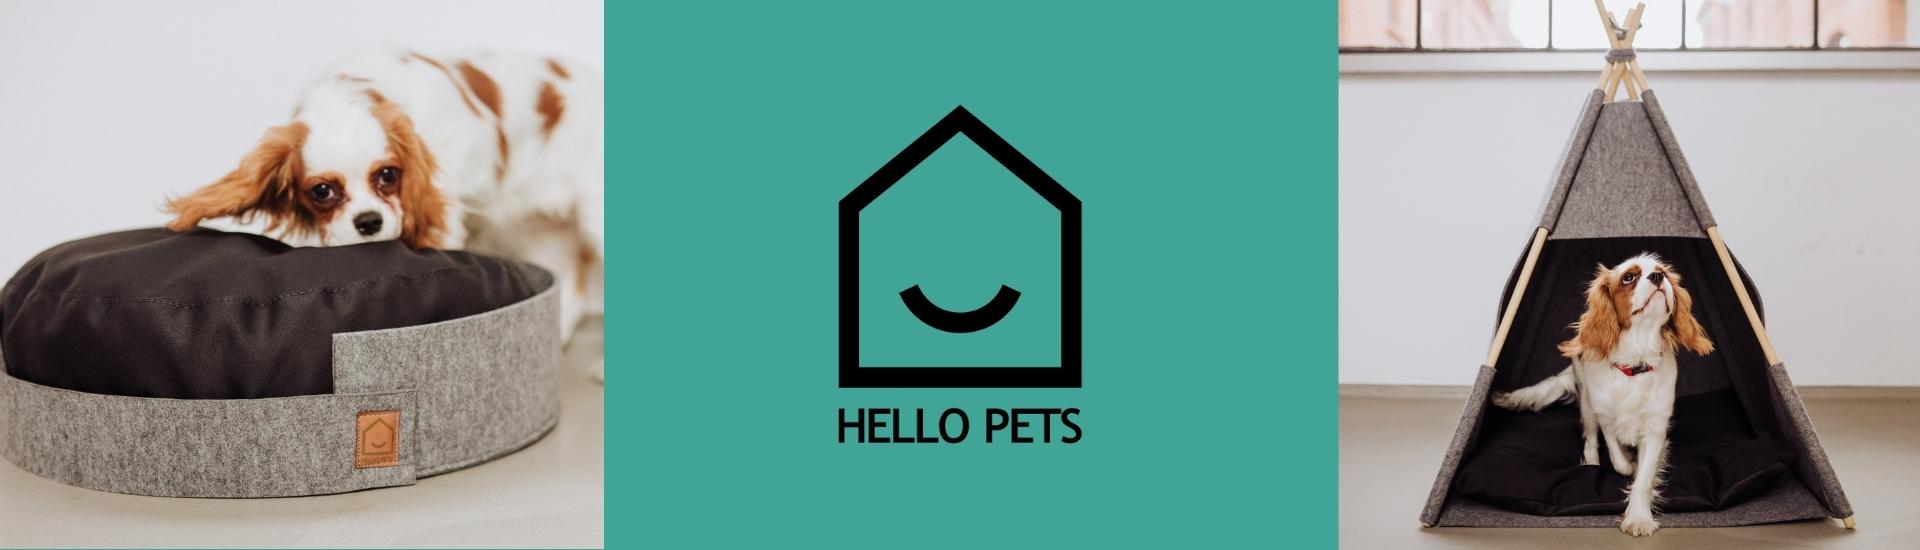 hello pets sur casalou